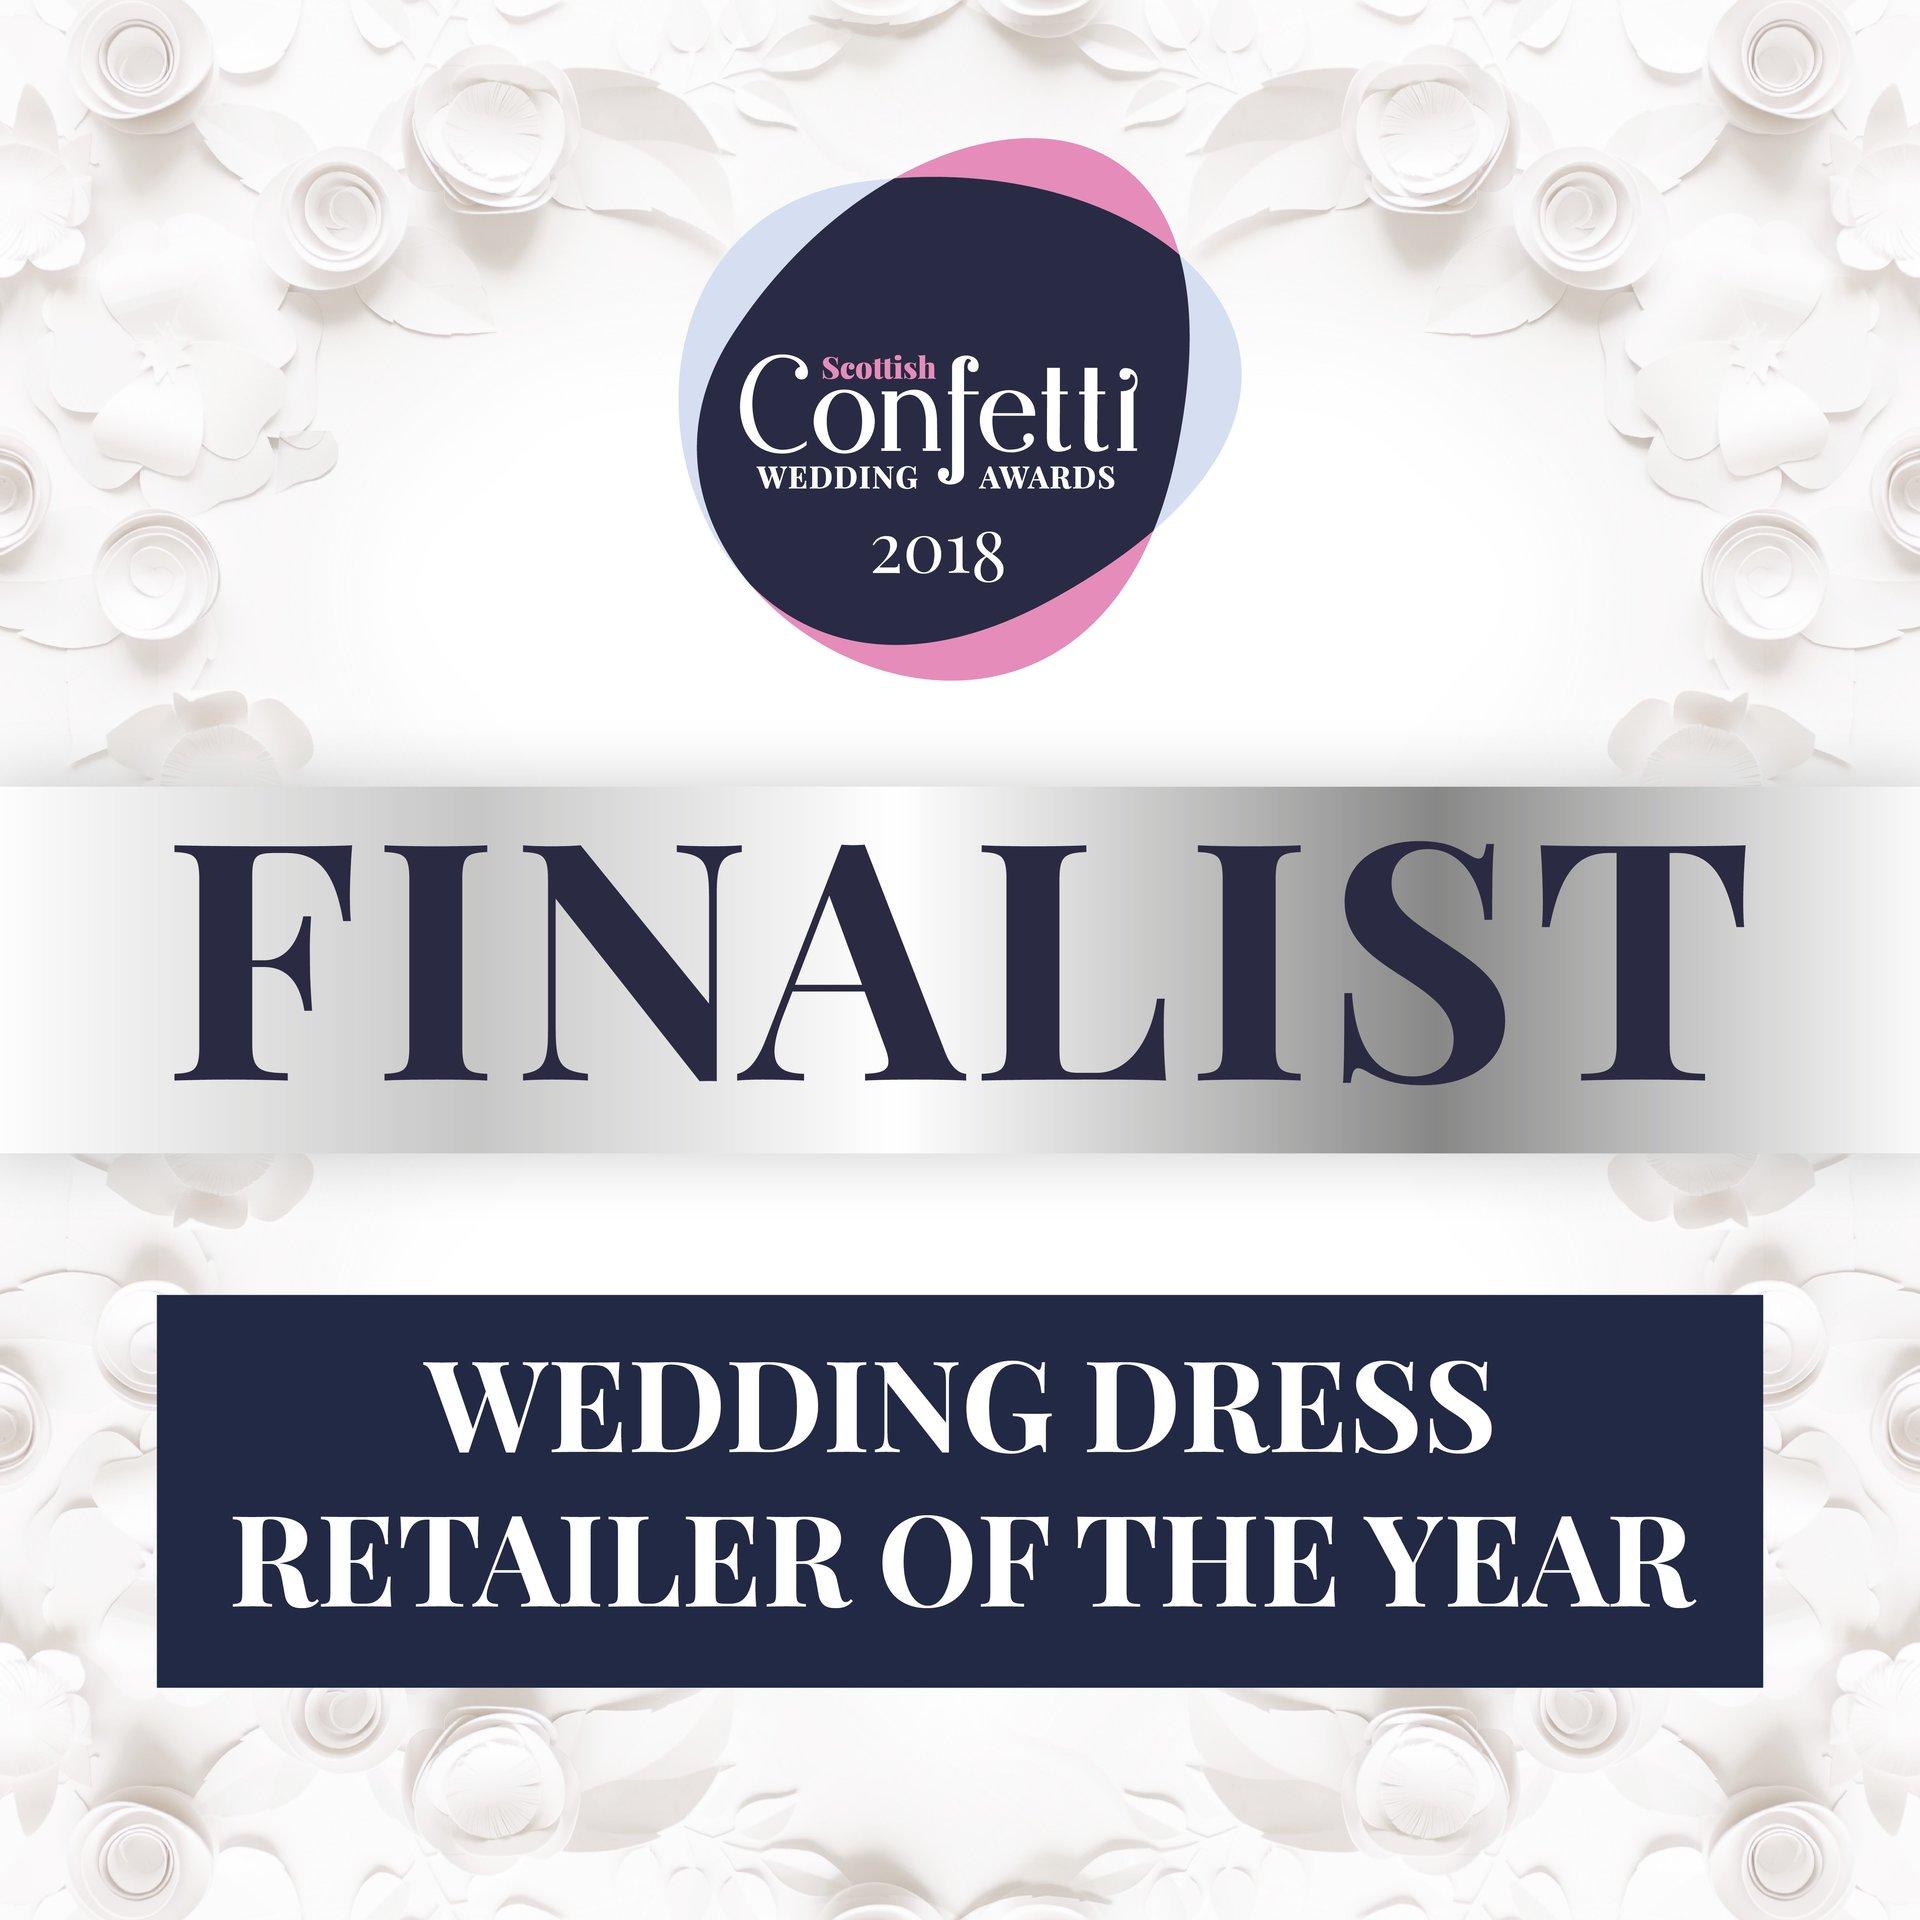 Unique Wedding Dresses Scotland: Private Shopping For Wedding Dresses